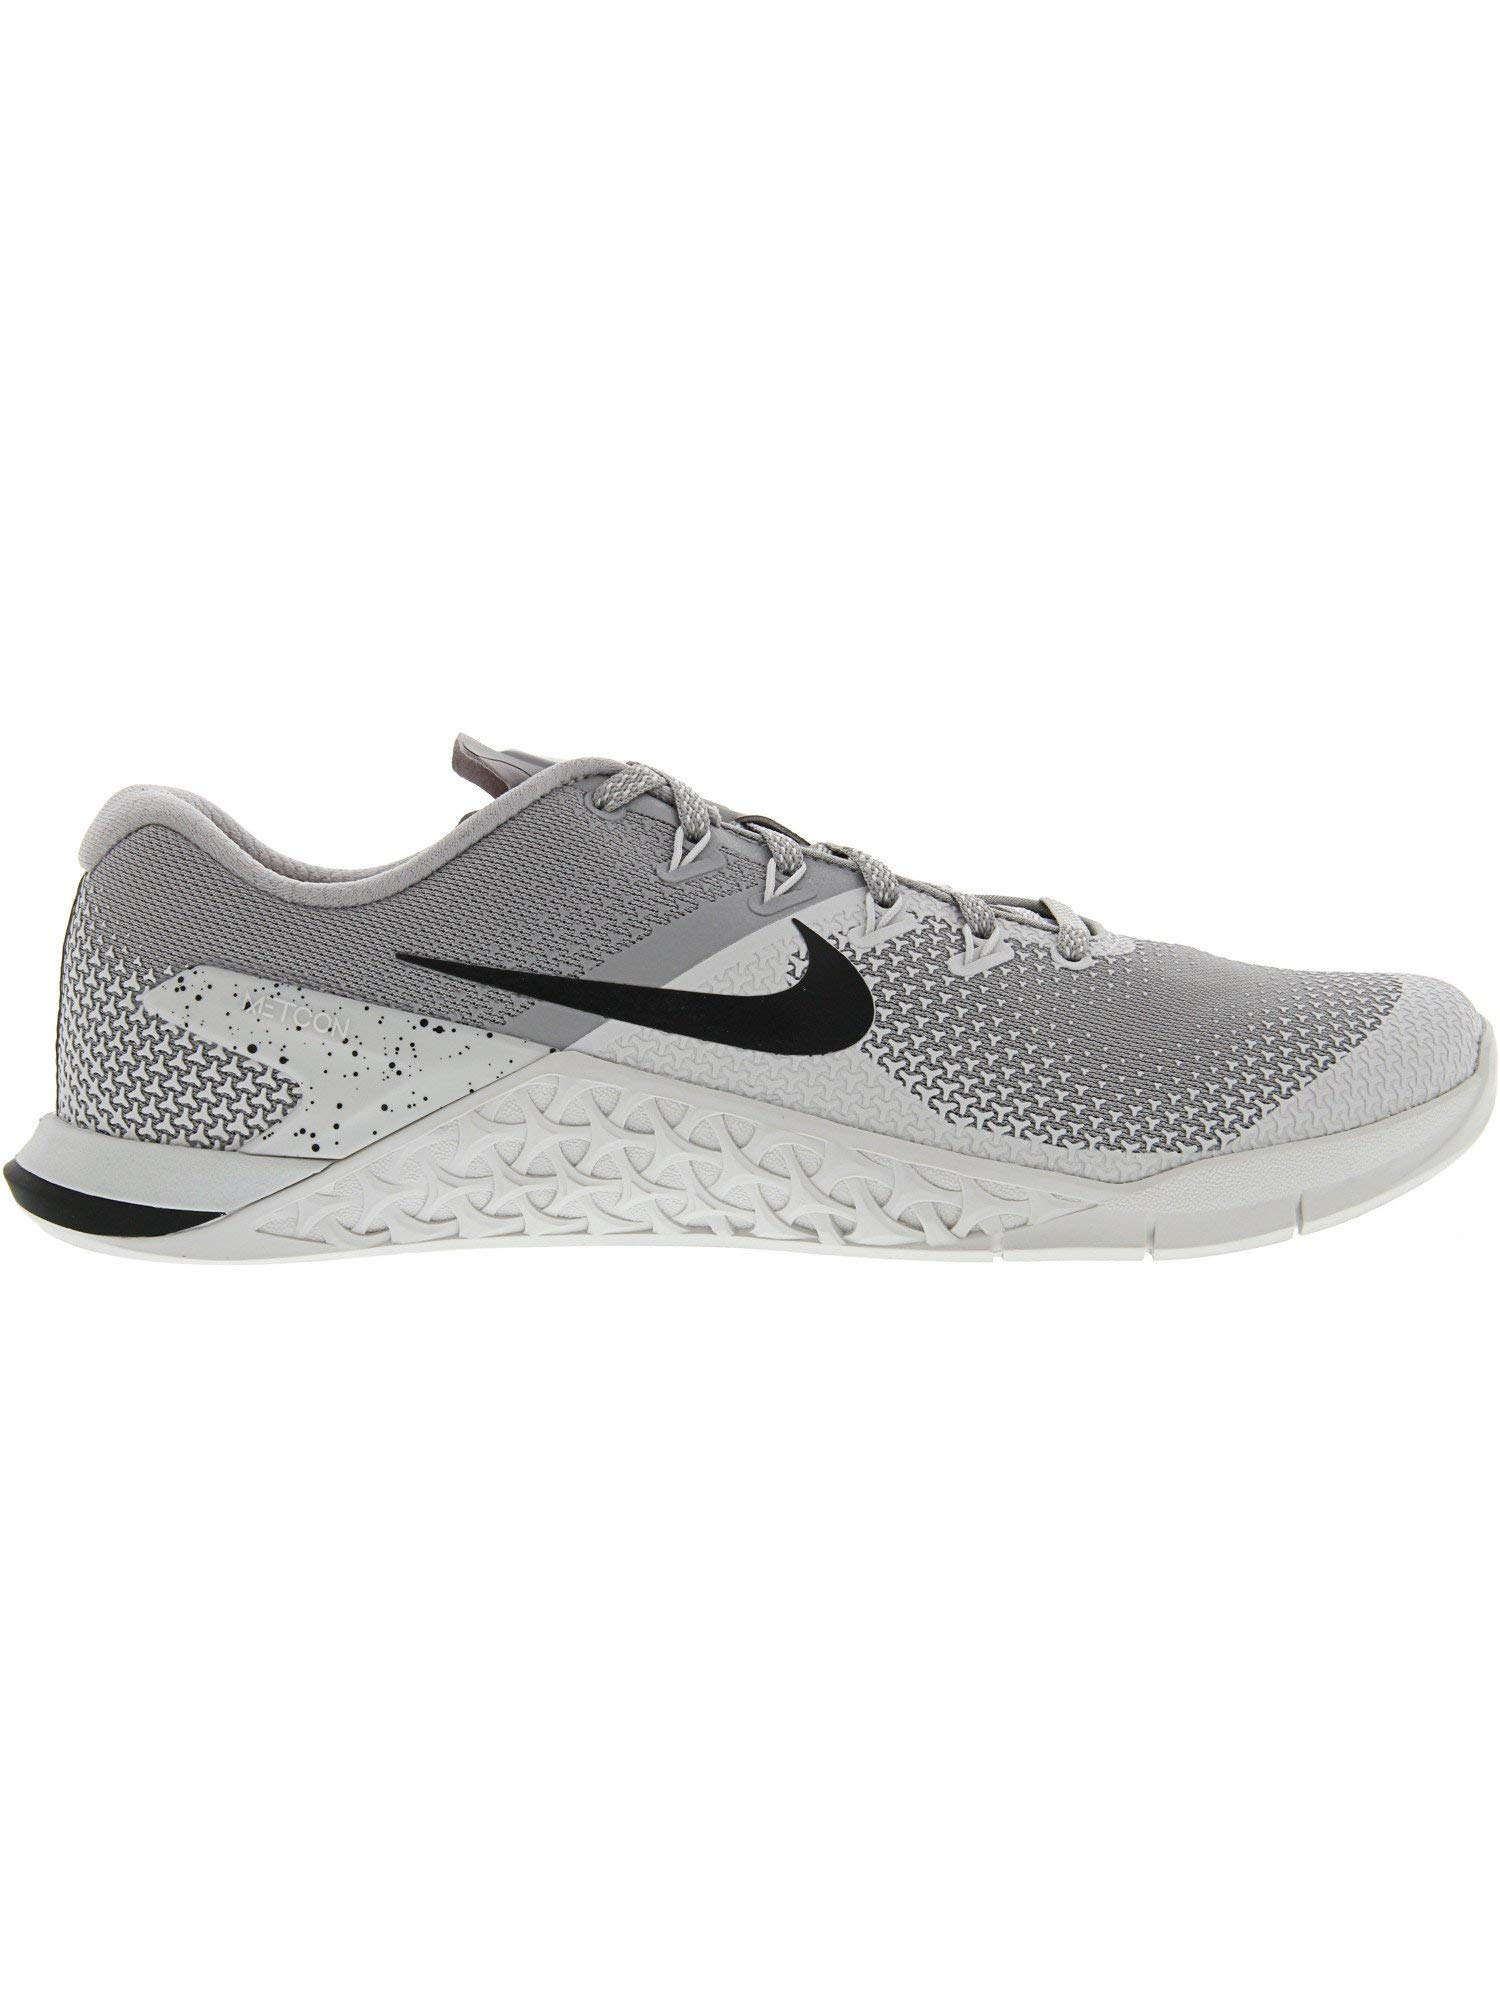 Nike Men's Metcon 4 Atmosphere Grey/Black Ankle-High Cross Trainer Shoe - 6.5M by Nike (Image #4)